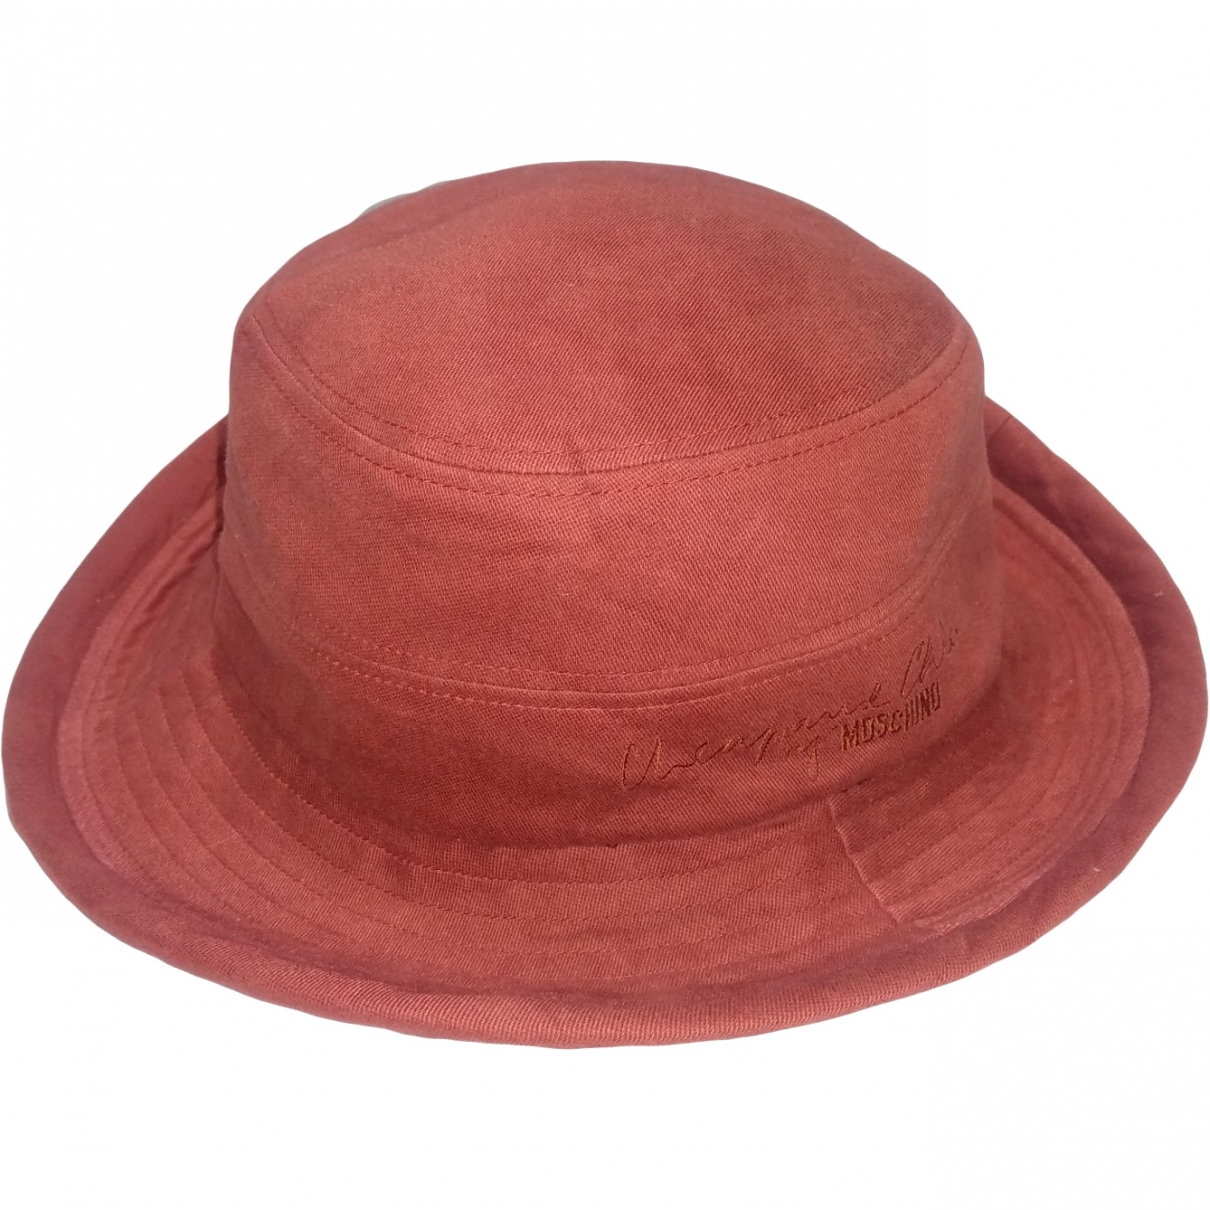 Moschino Cheap And Chic \N Orange Cotton hat for Women M International